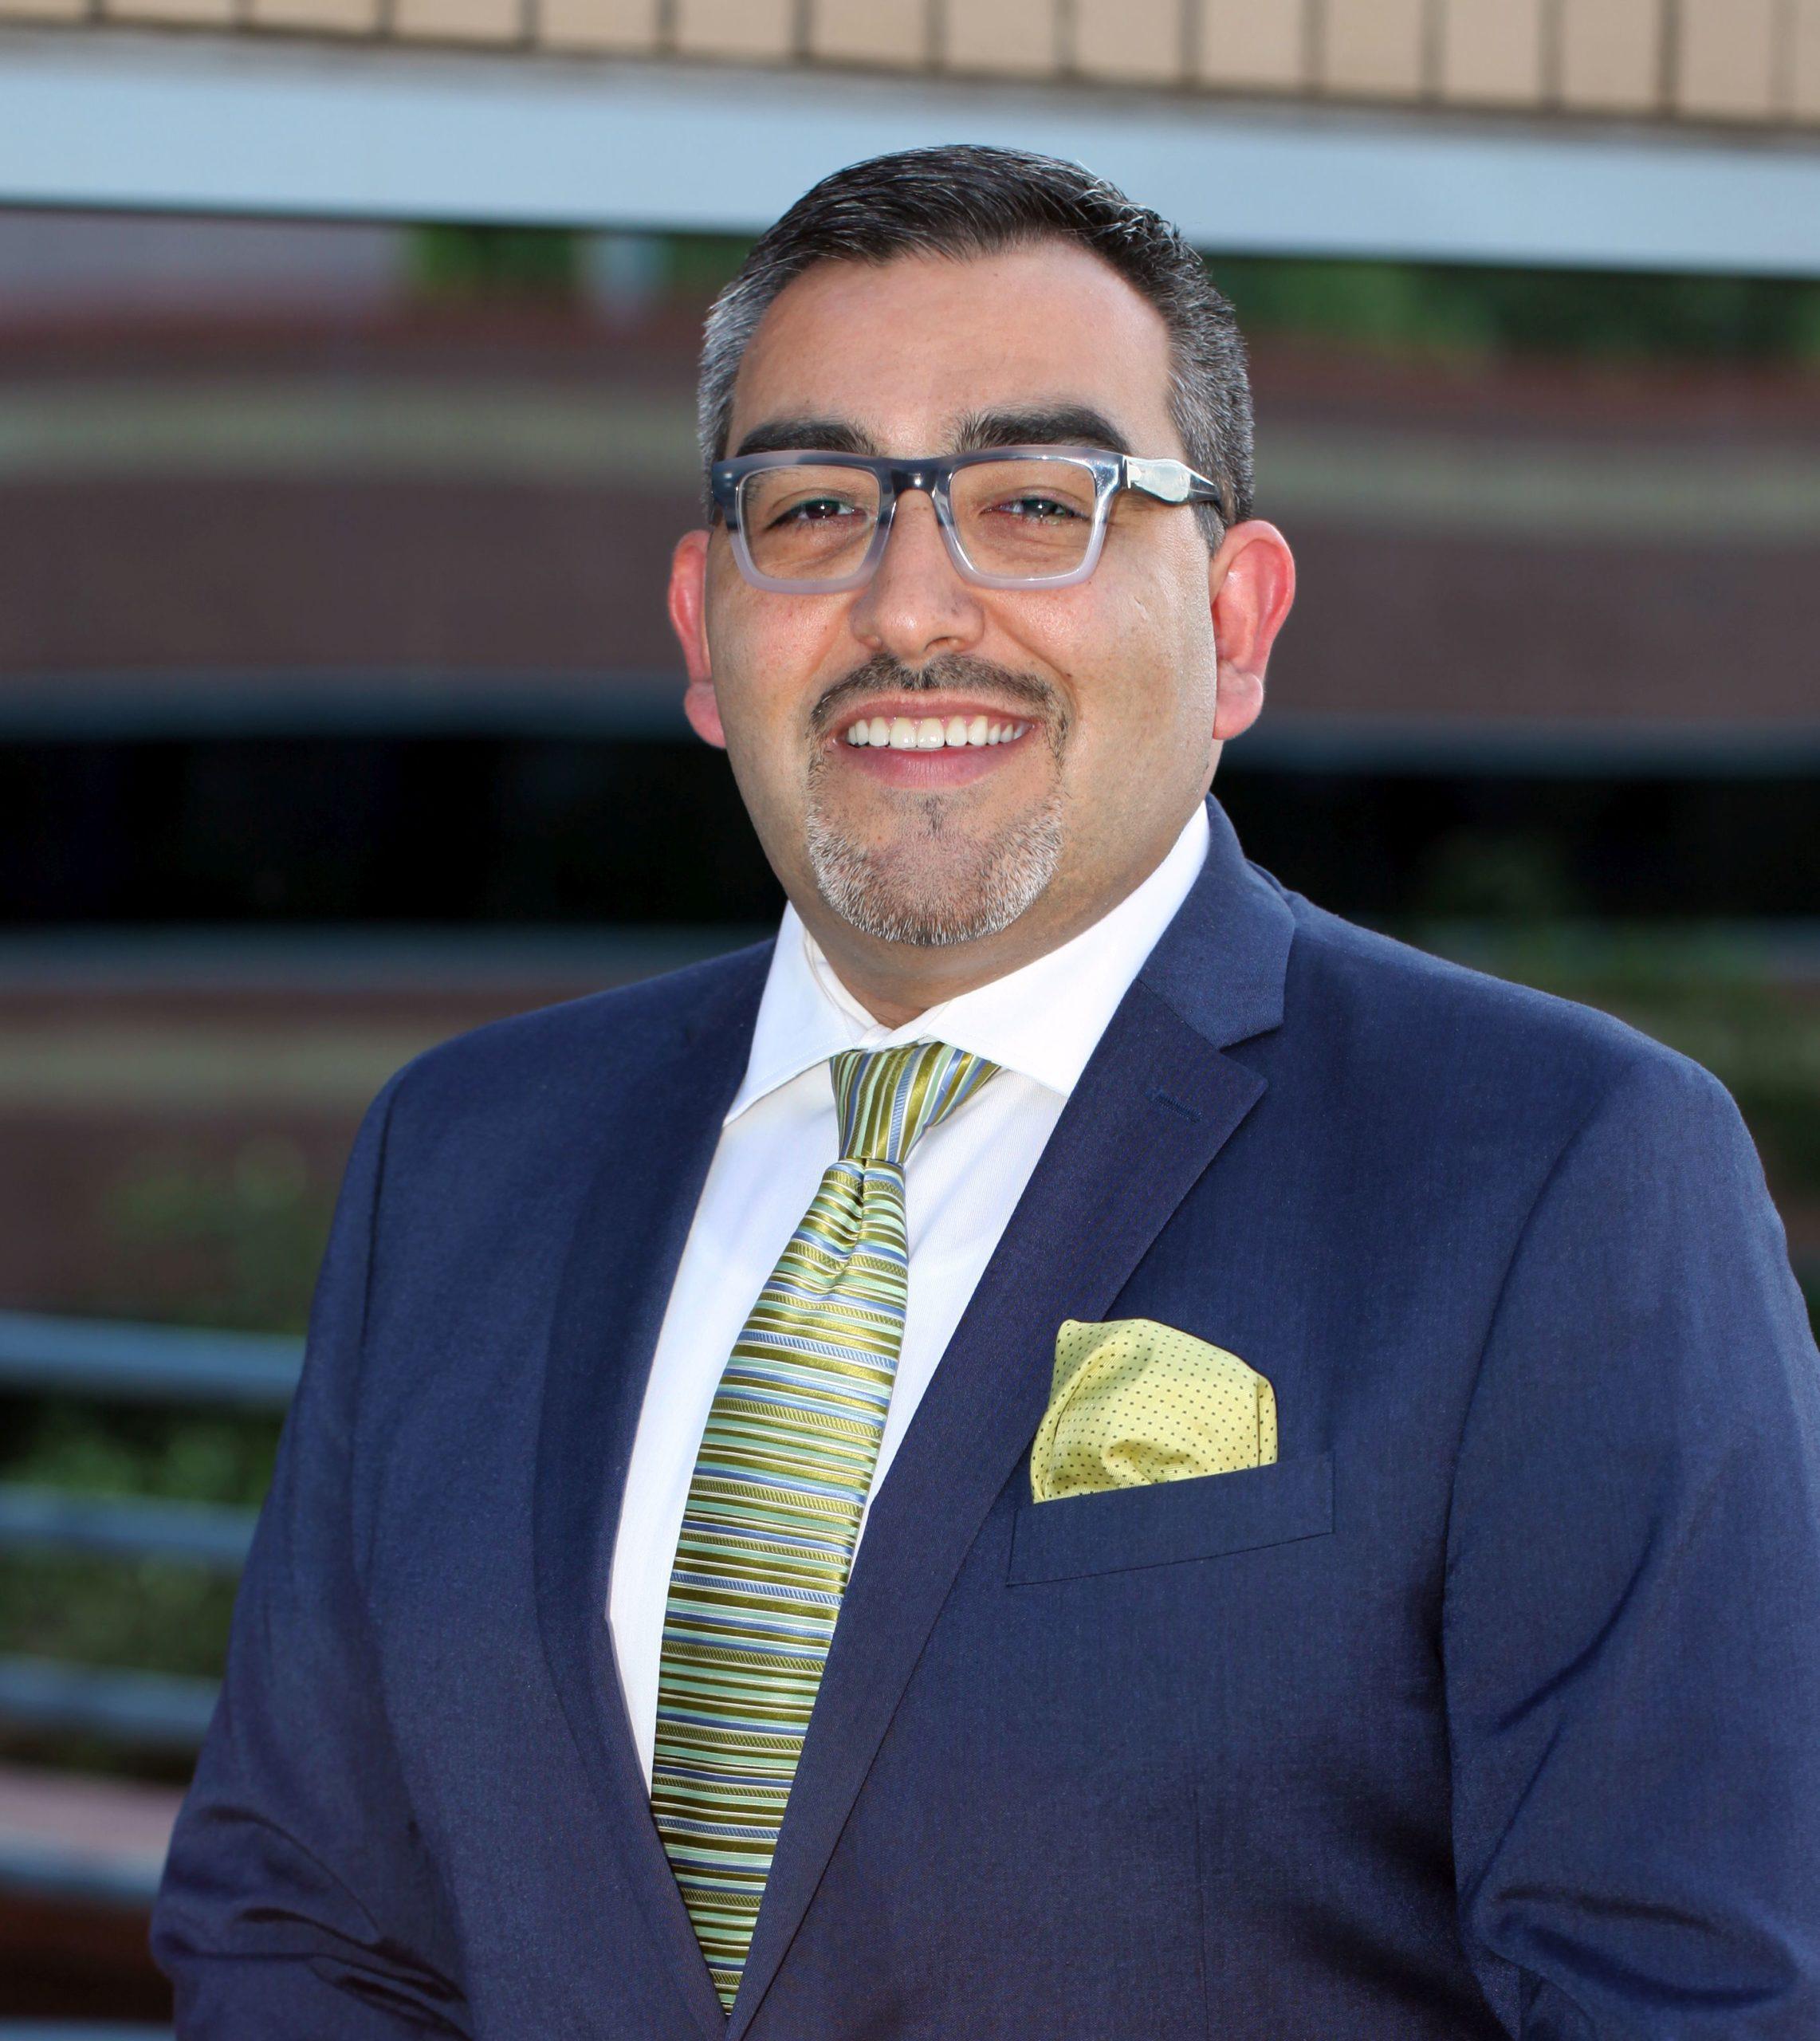 Arlington School Board Names New Superintendent Following